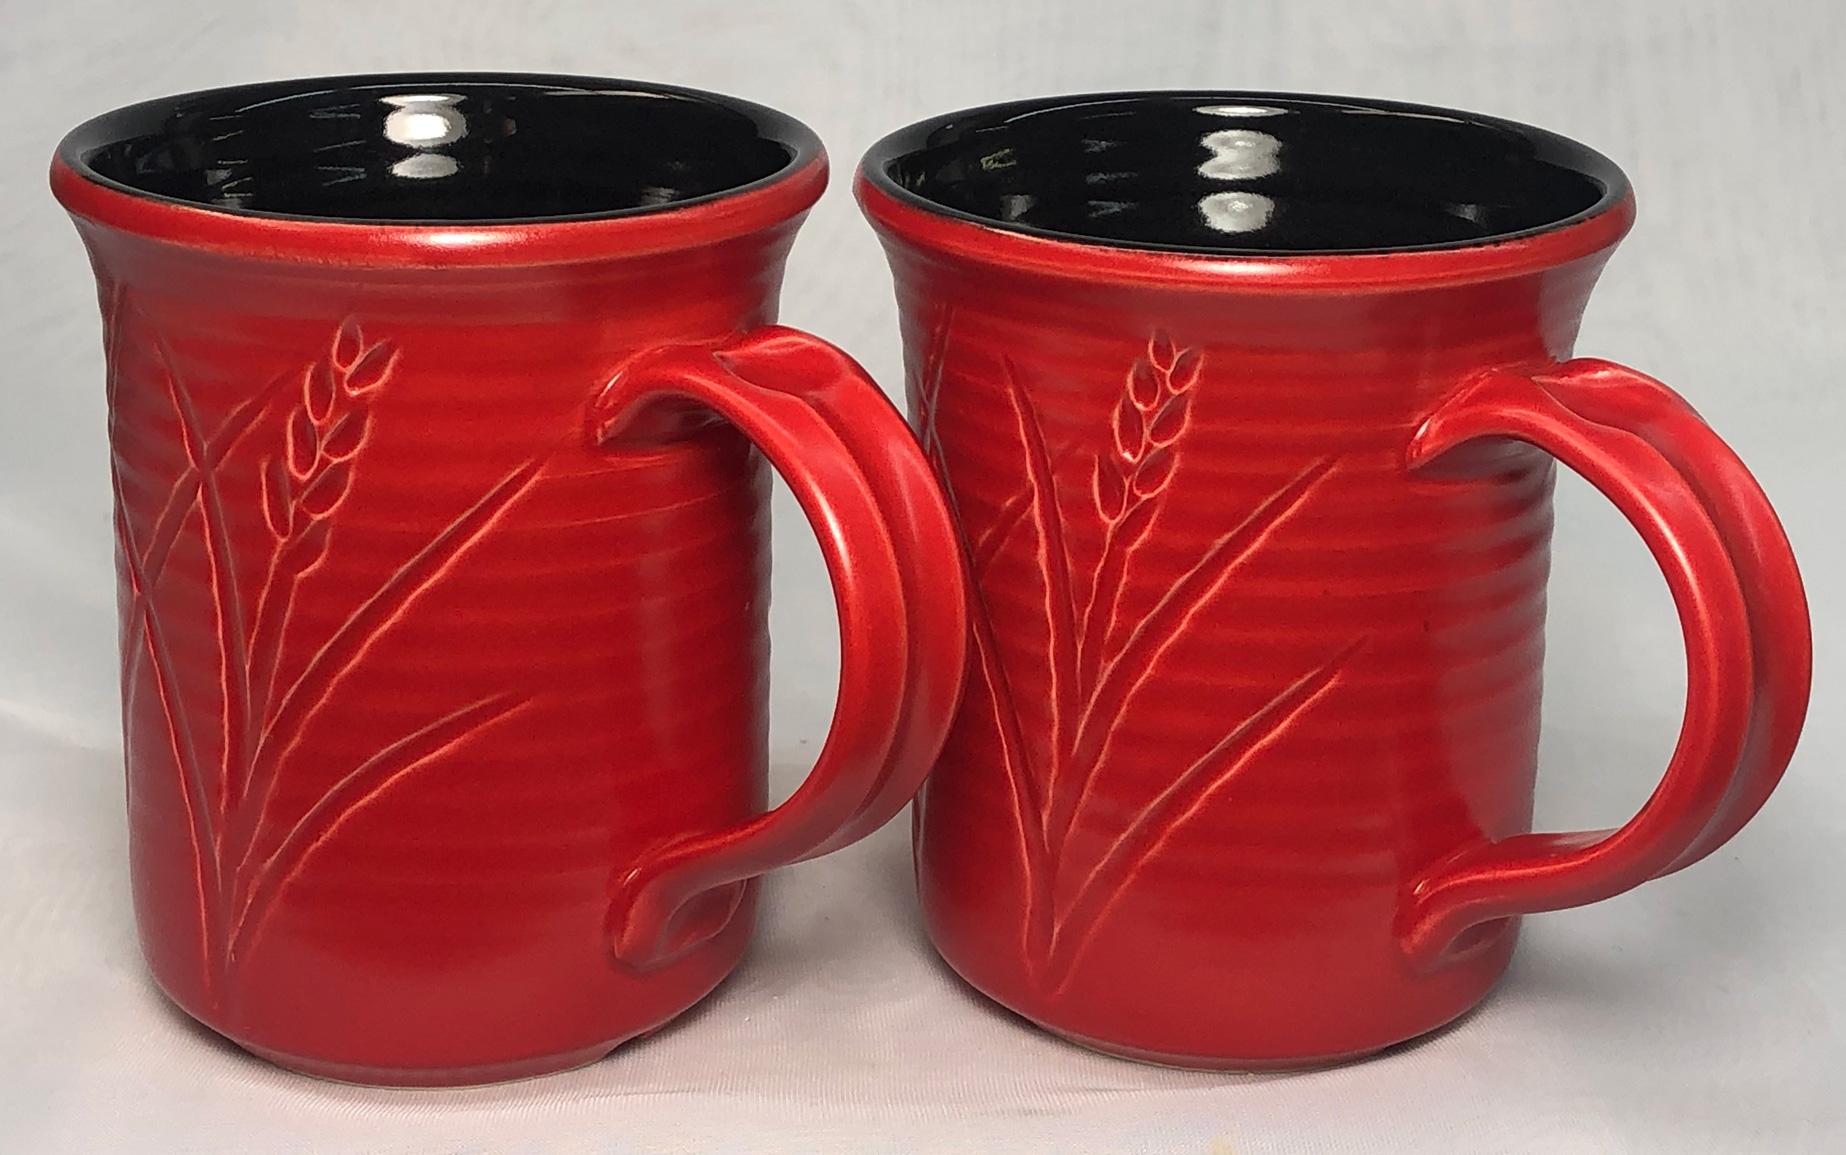 Two mugs, black glaze on the inside, red glaze on the outside